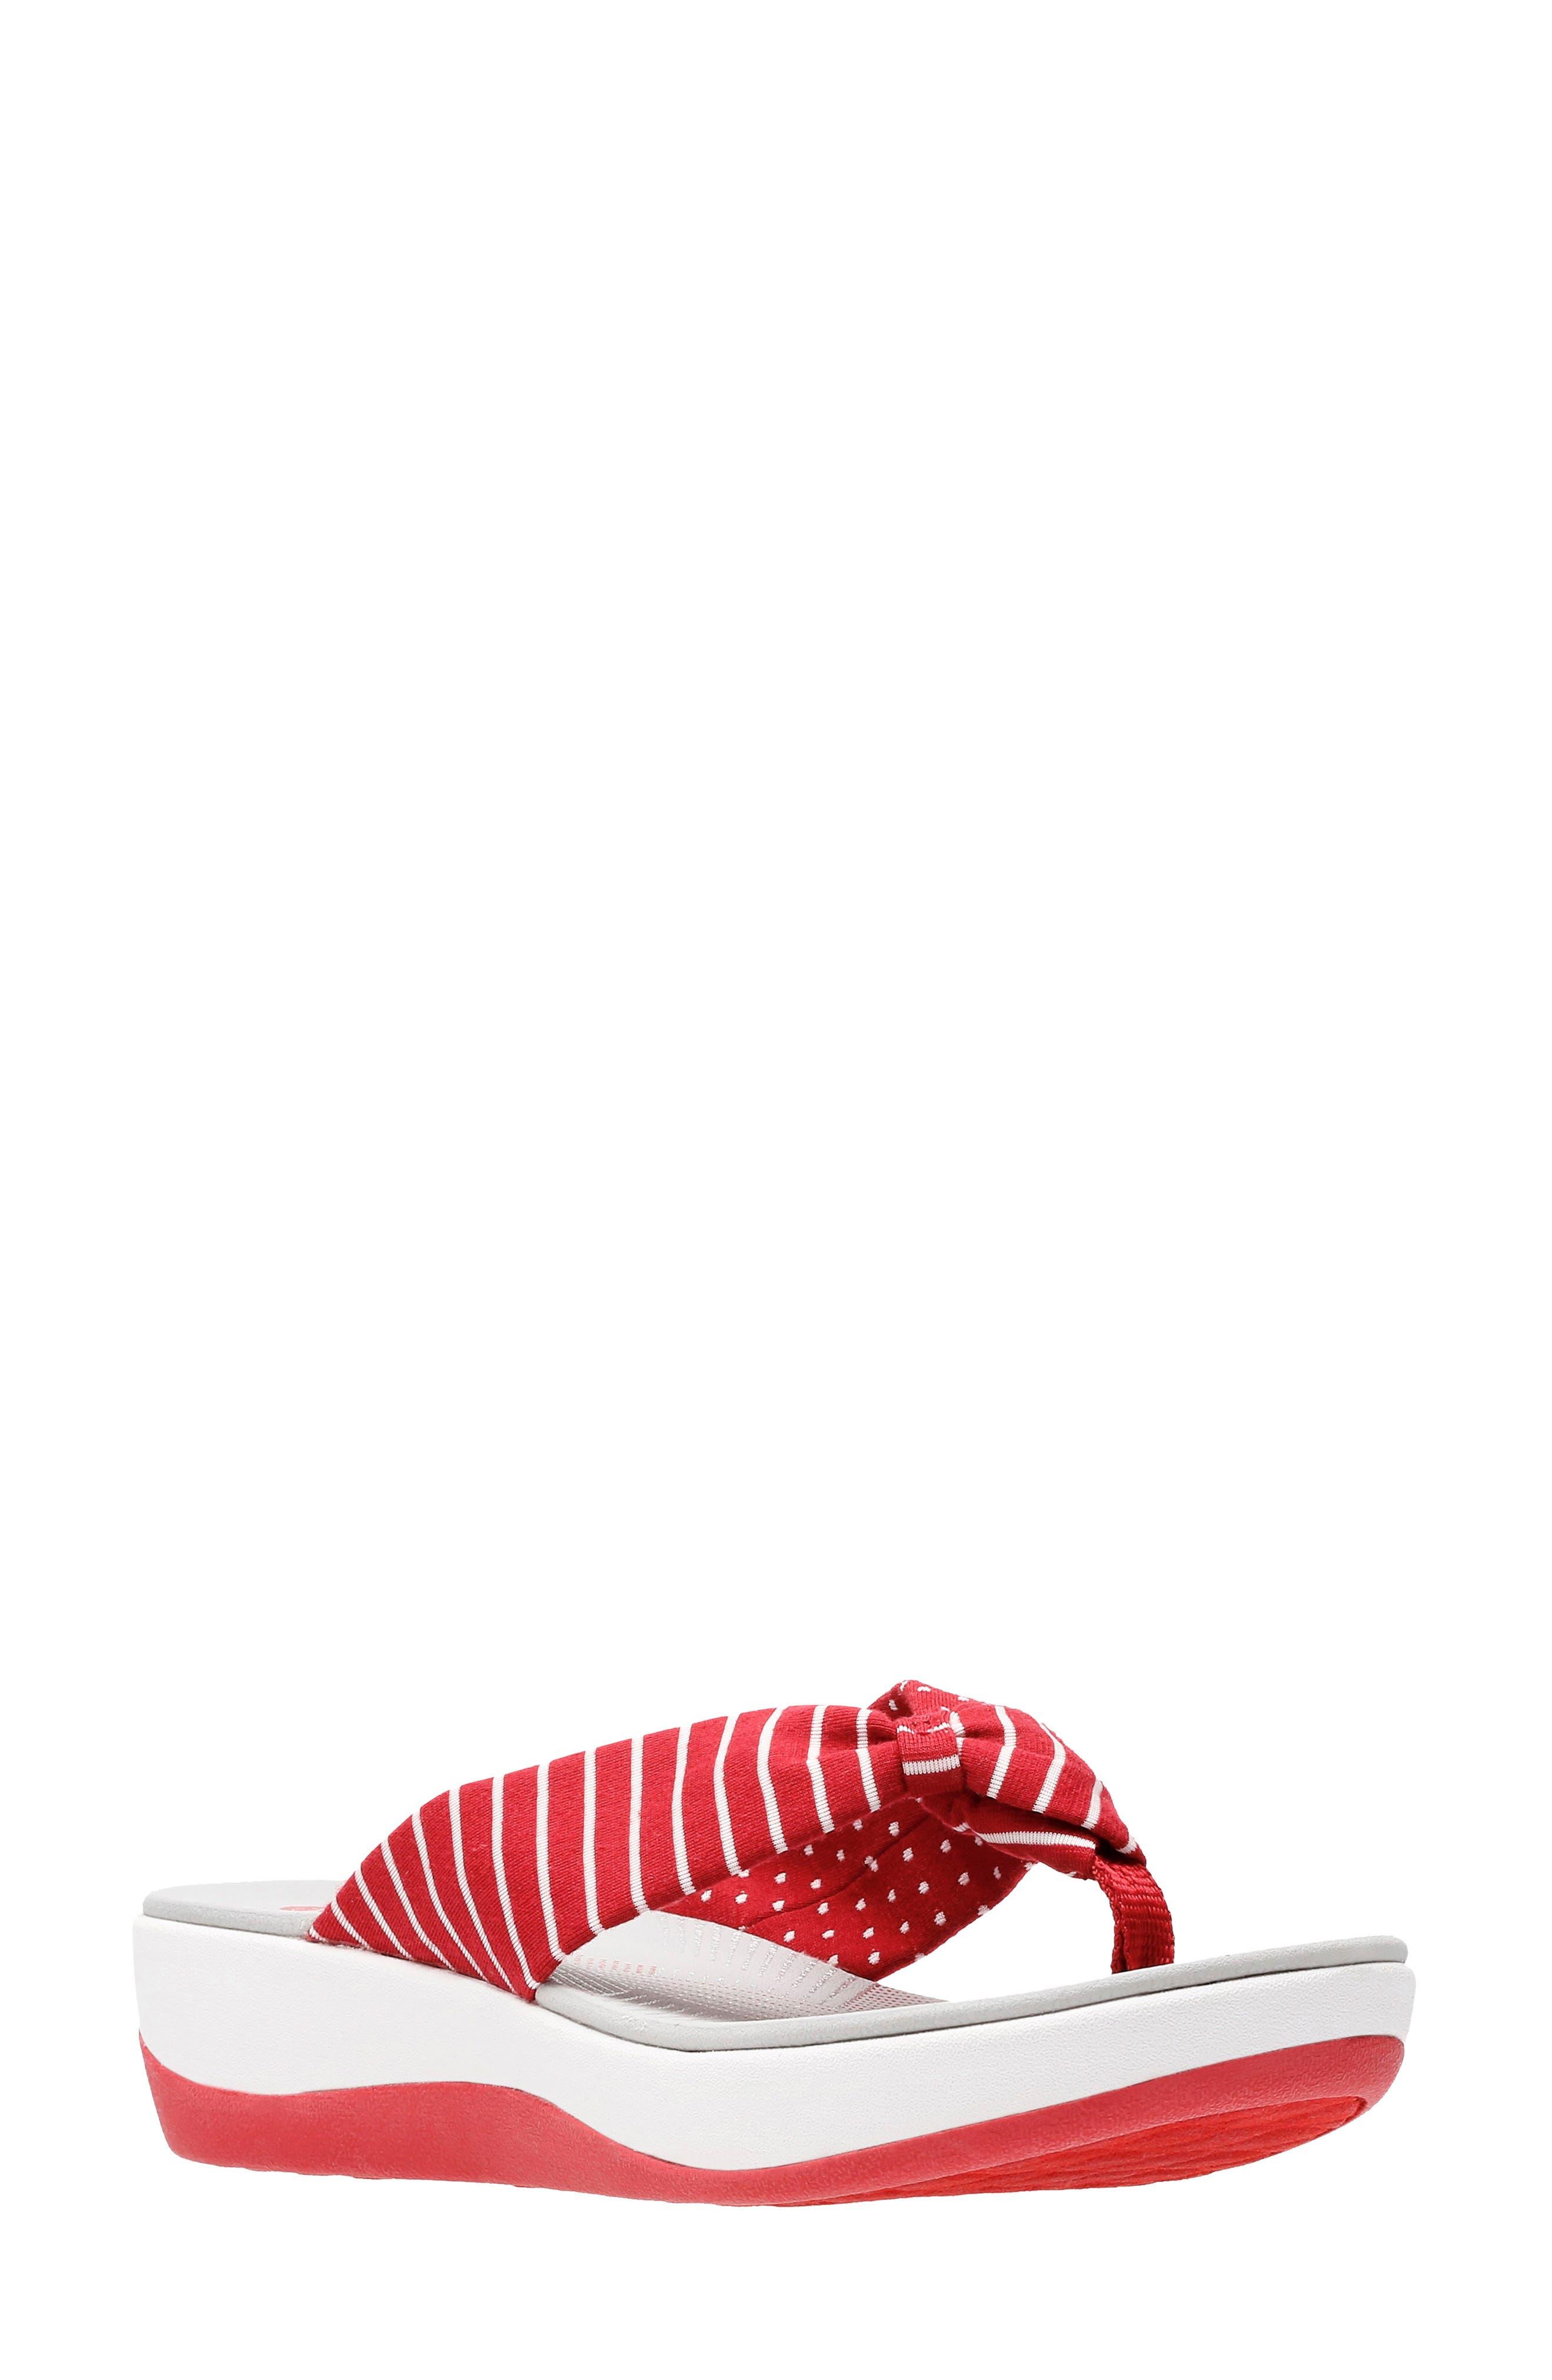 723d34d53f208 Women s Flip Flops New Arrivals  Clothing